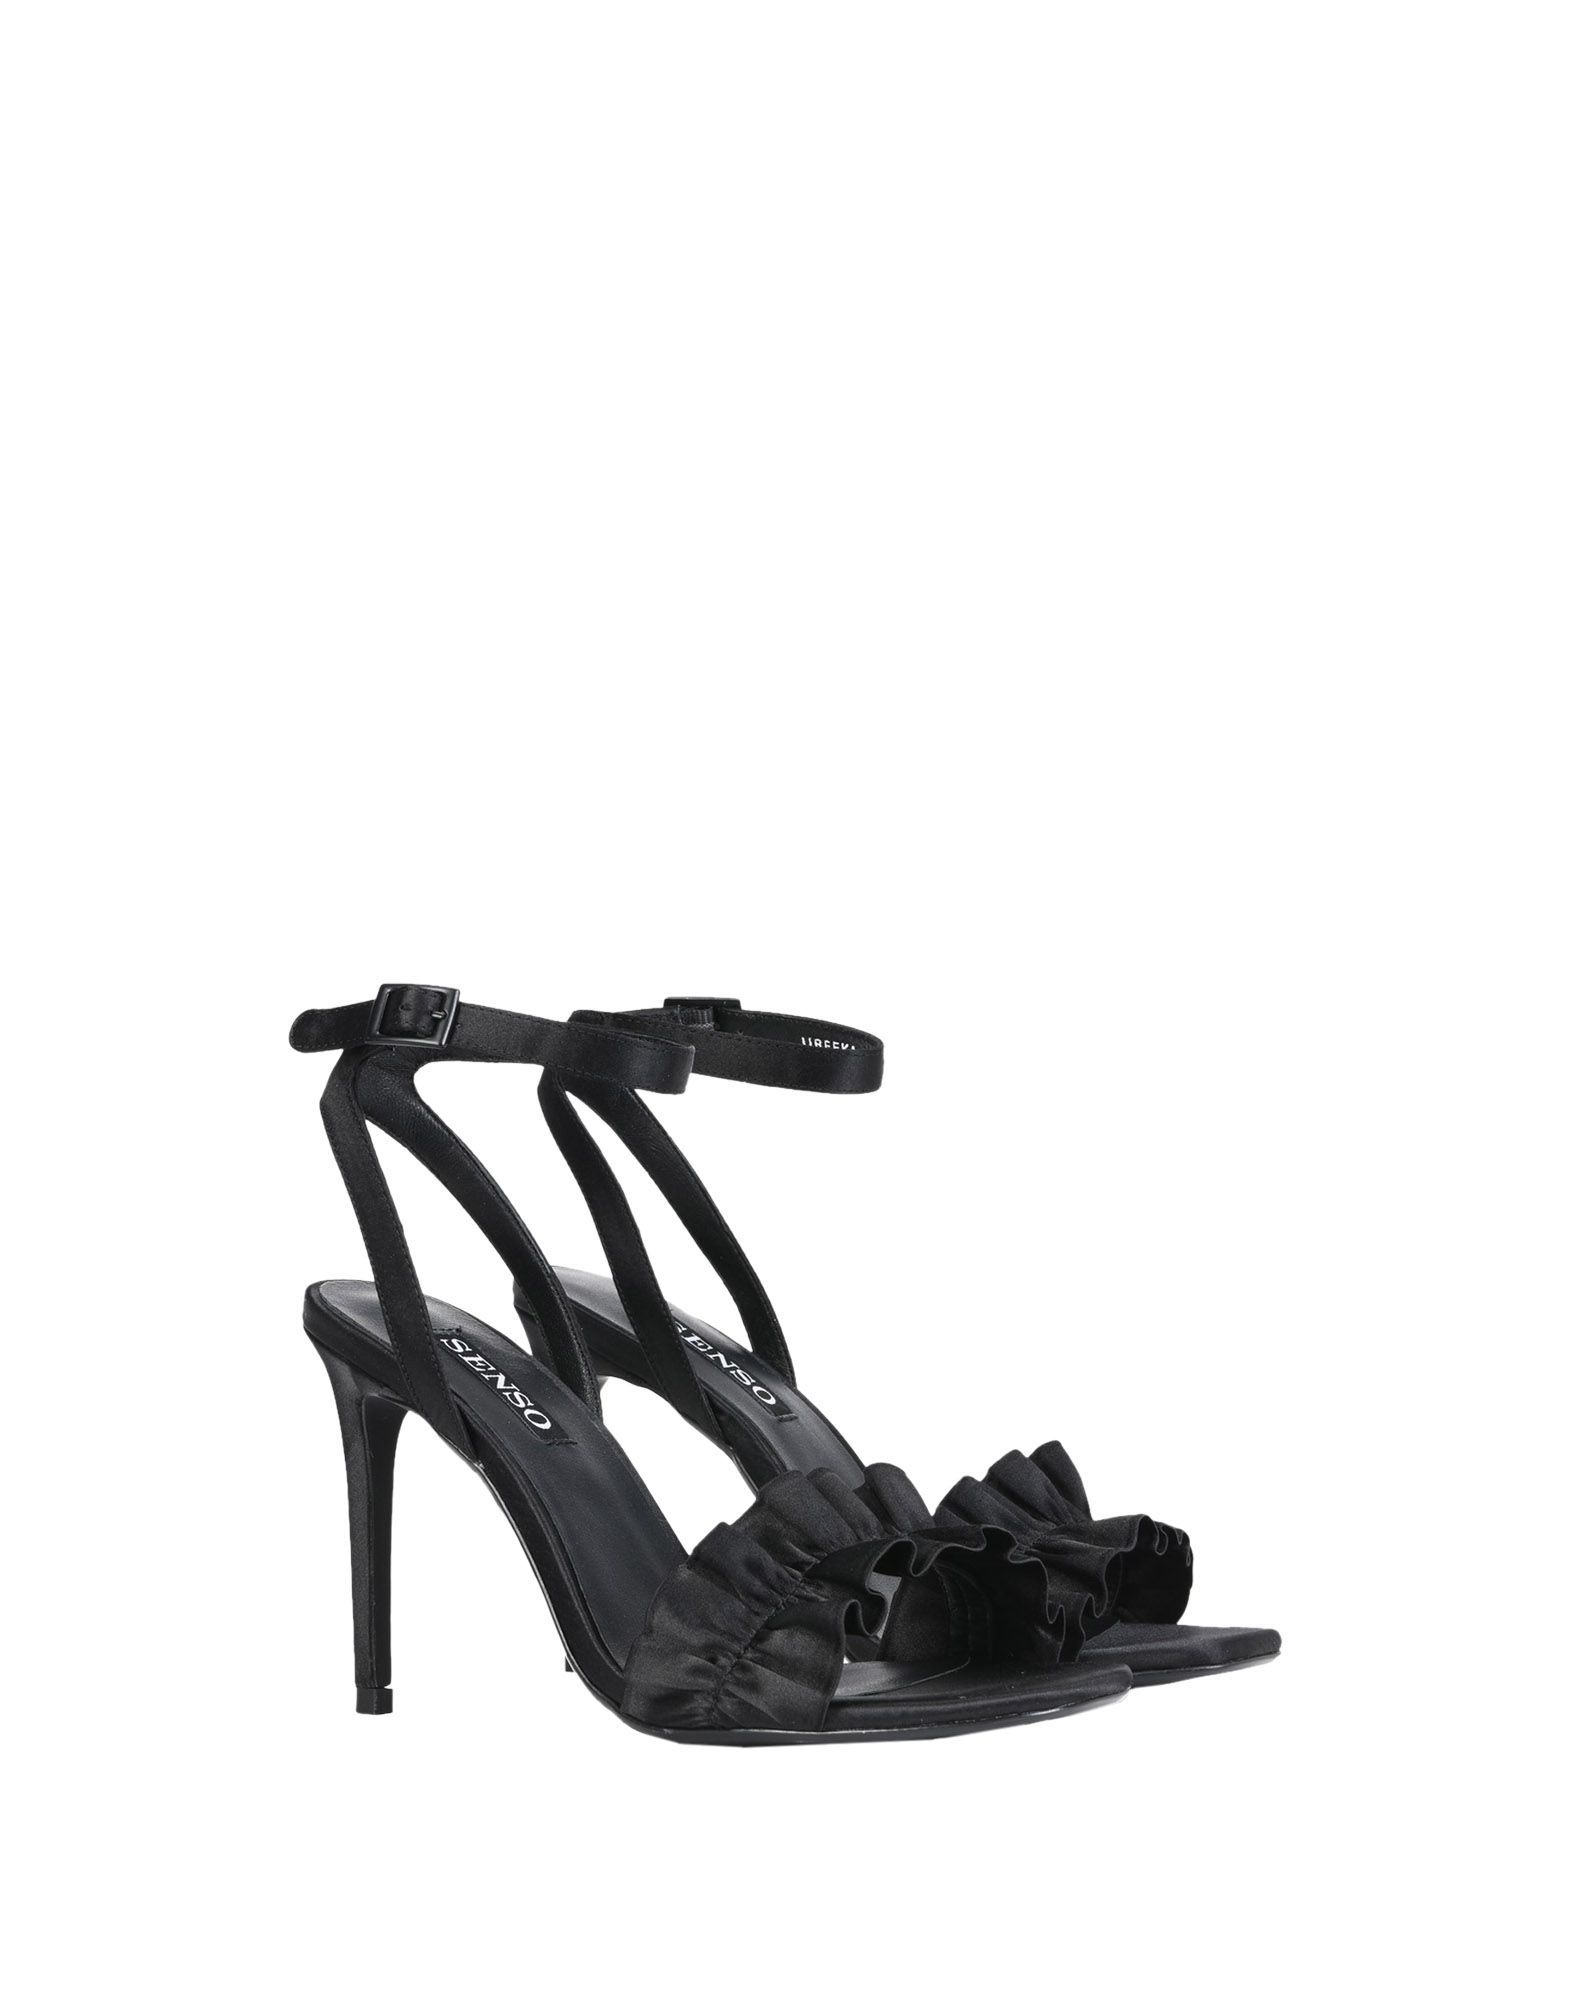 Senso Black Sandals